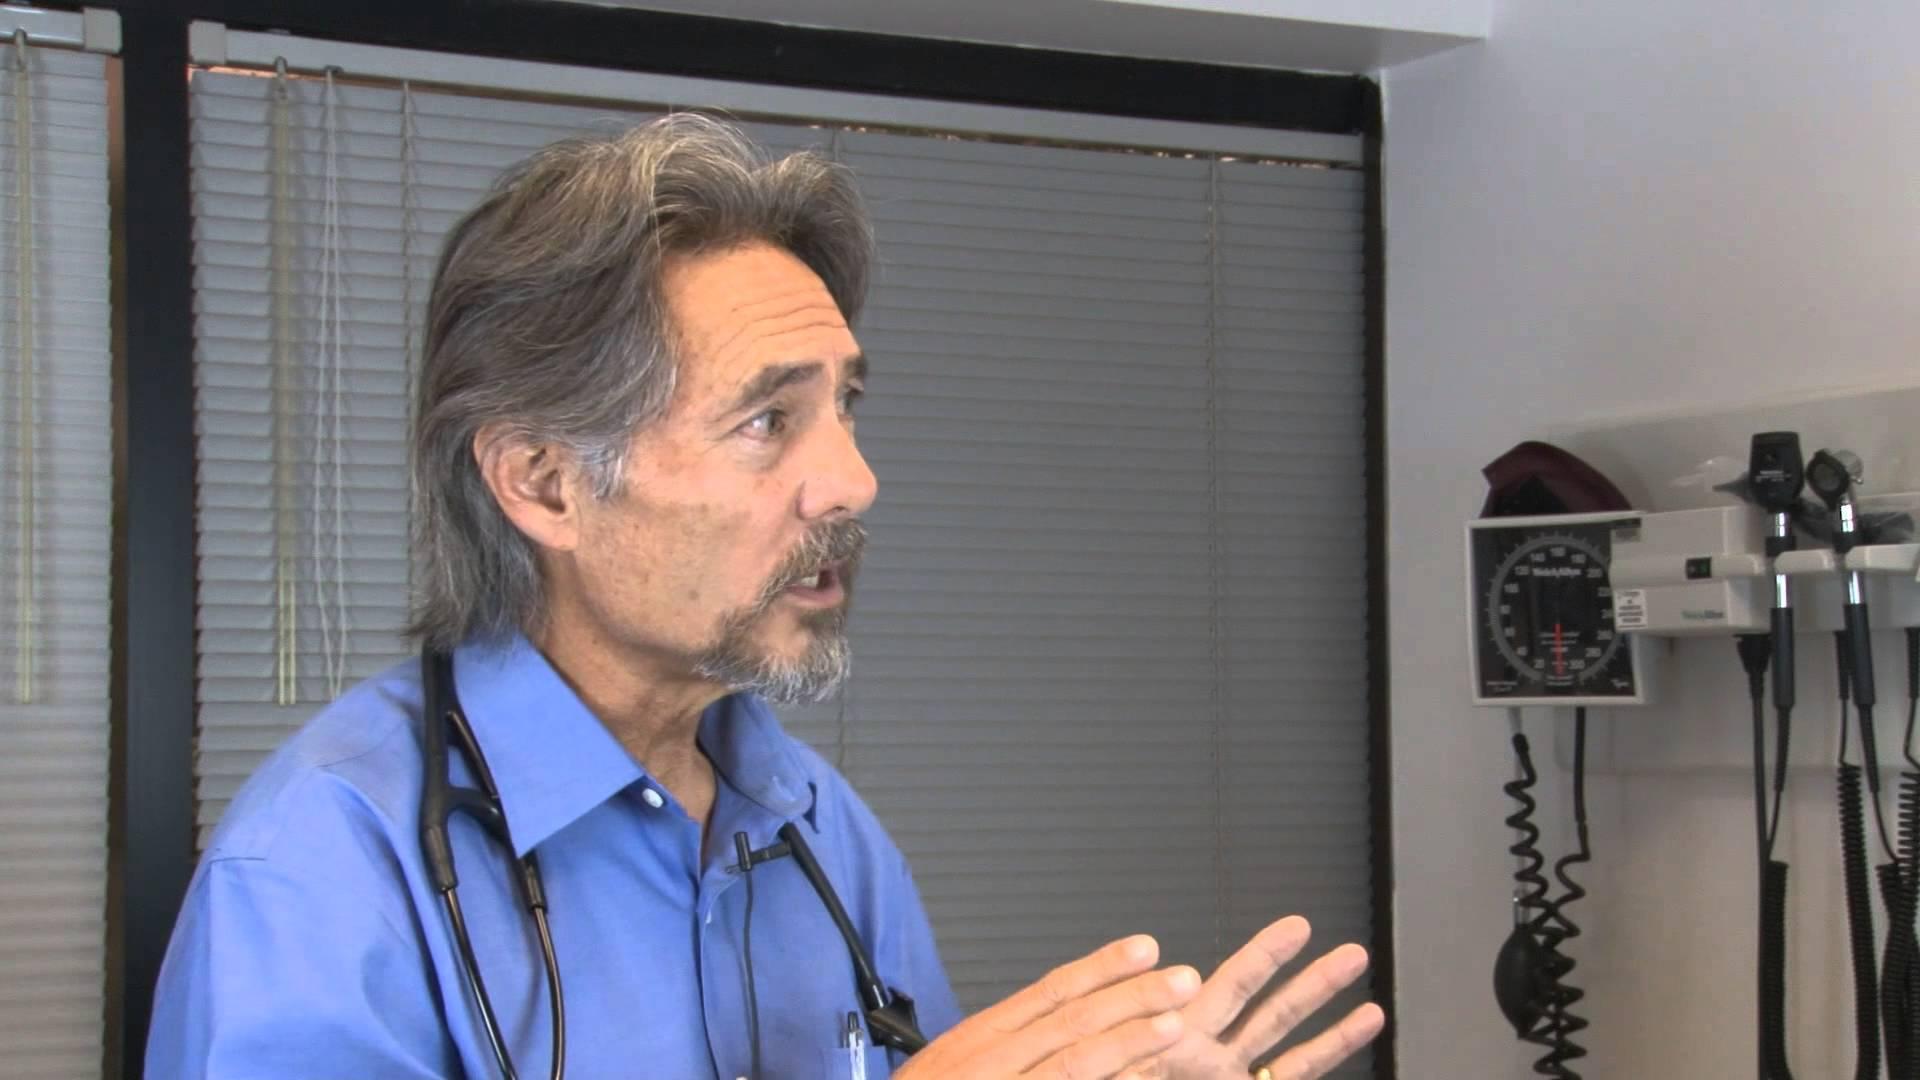 Доктор Кен Фудзиока полагает, что лираглутид снижает риск развития сахарного диабета